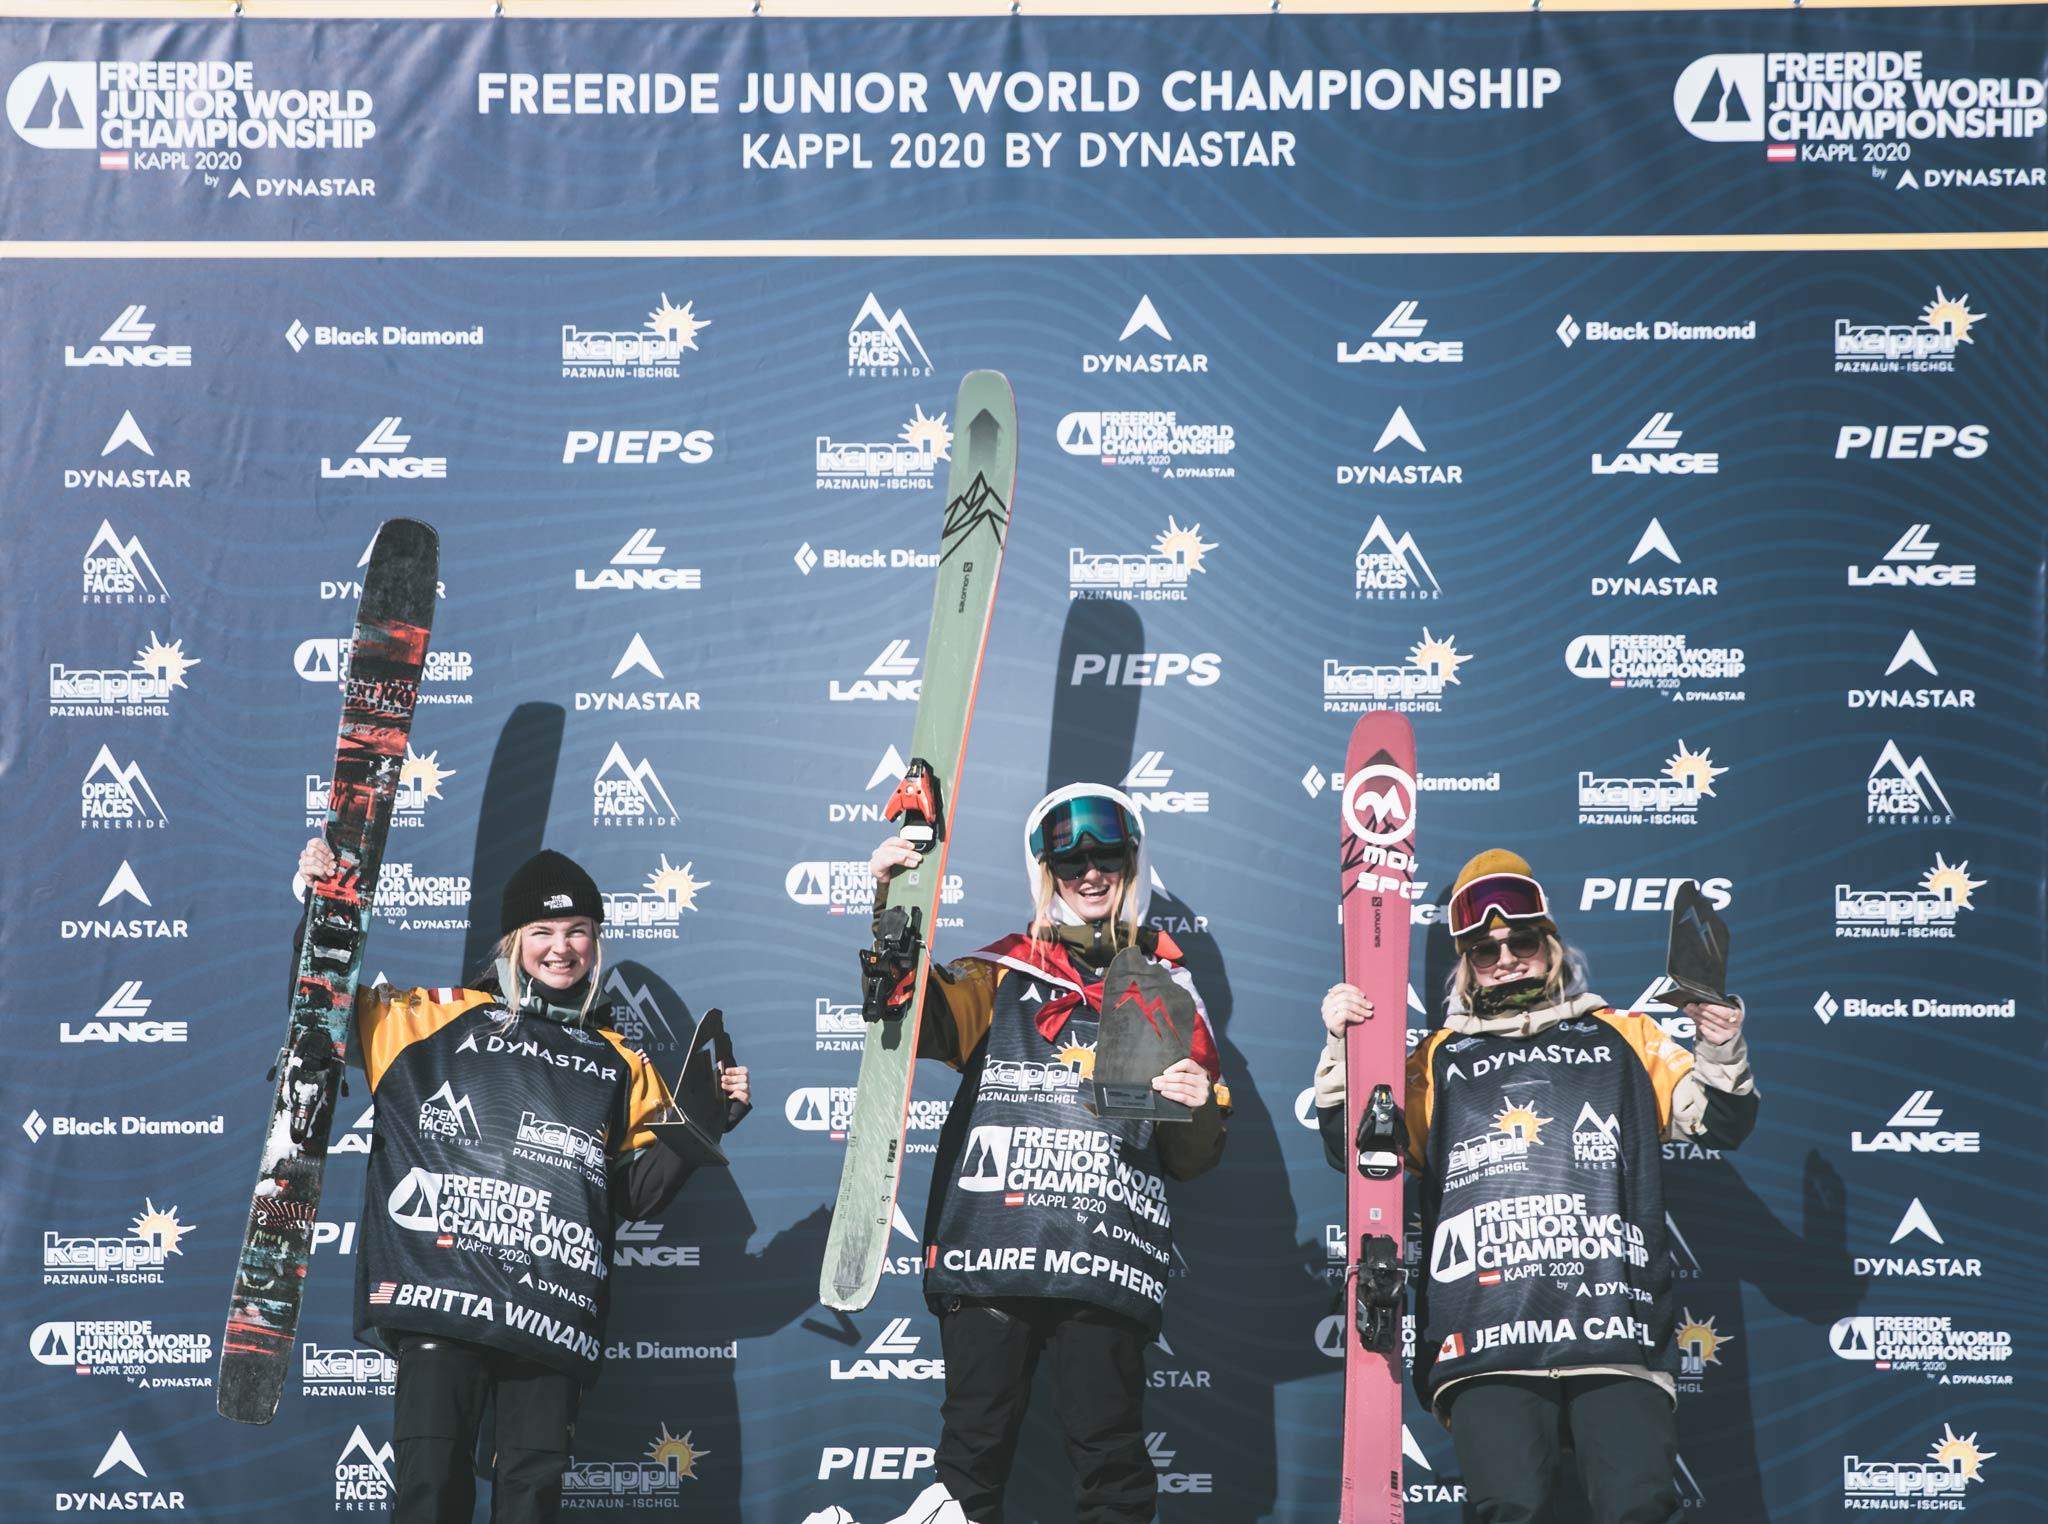 Die drei besten Frauen bei den Junior World Championship Kappl 2020: Britta Winans (USA), Claire McPherson (CAN), Jemma Capel (CAN) - Foto: Mia Knoll